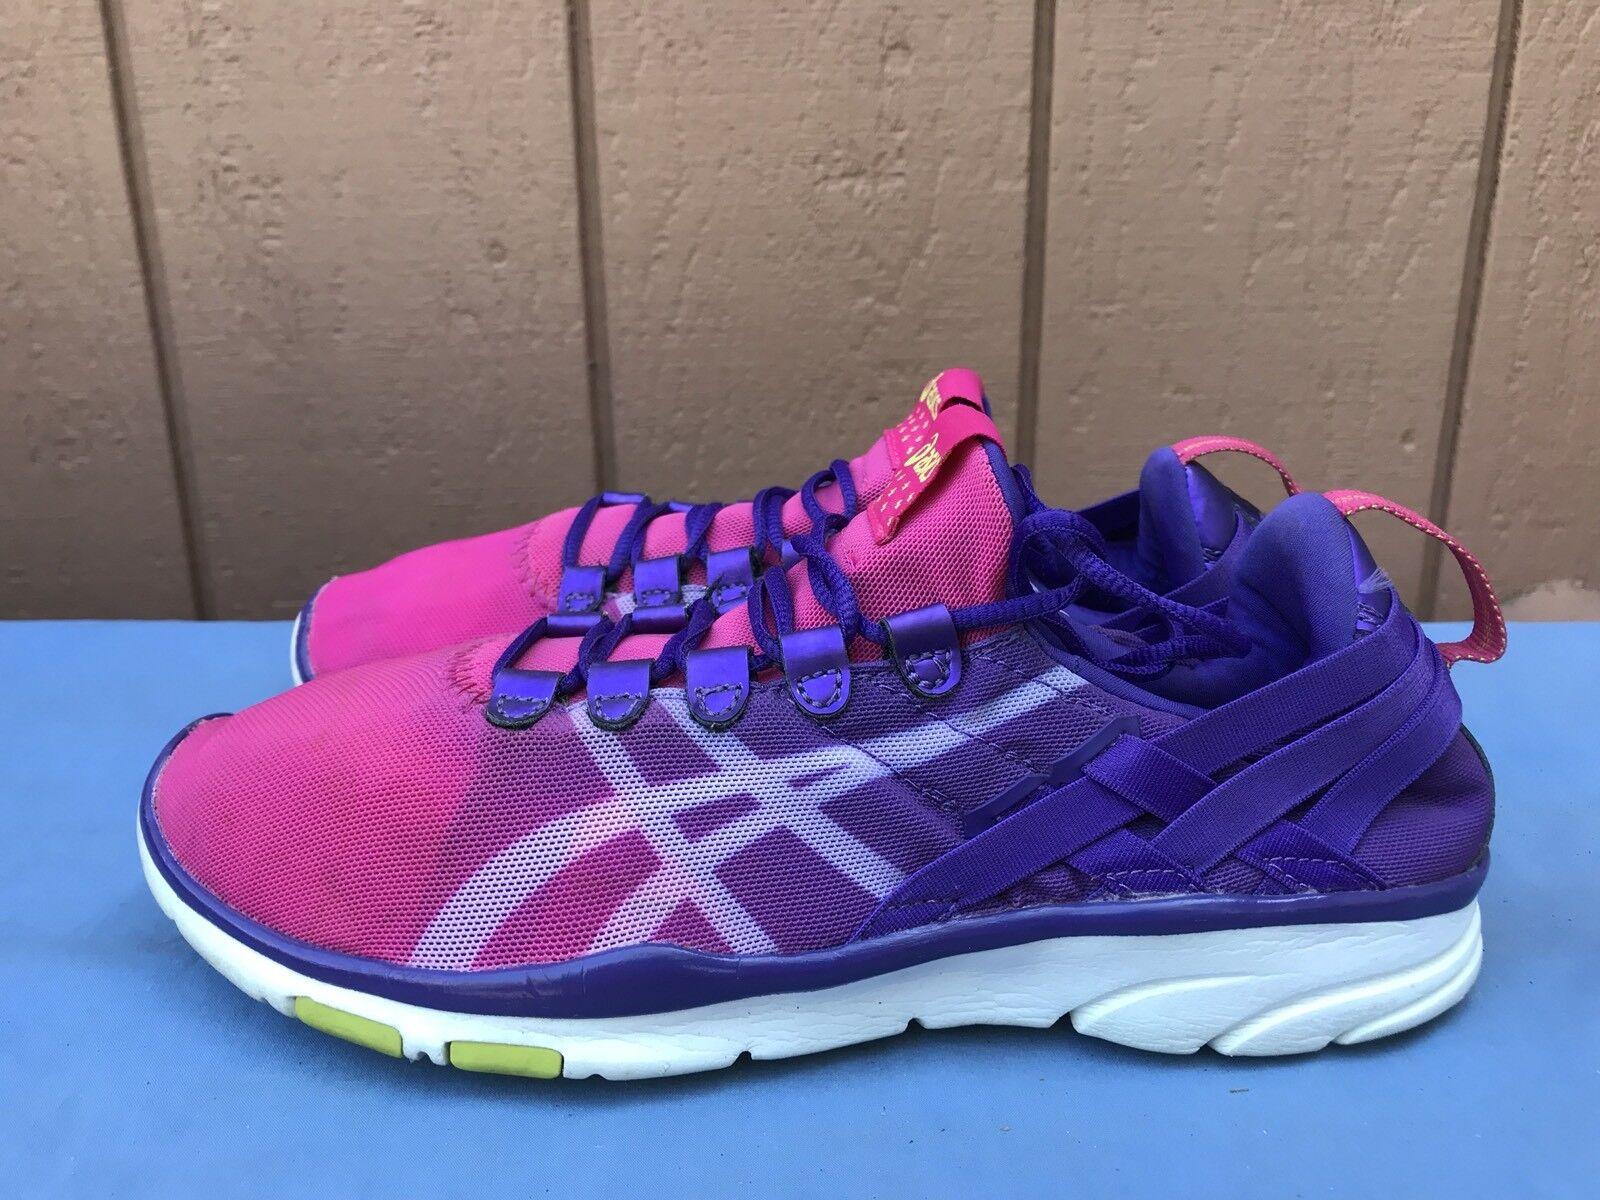 1af8fe50cbe41 Pink 7 Asics Sana Fit Us Shoes Euc Running Gel Women 5 Athletic TwPUqCZ